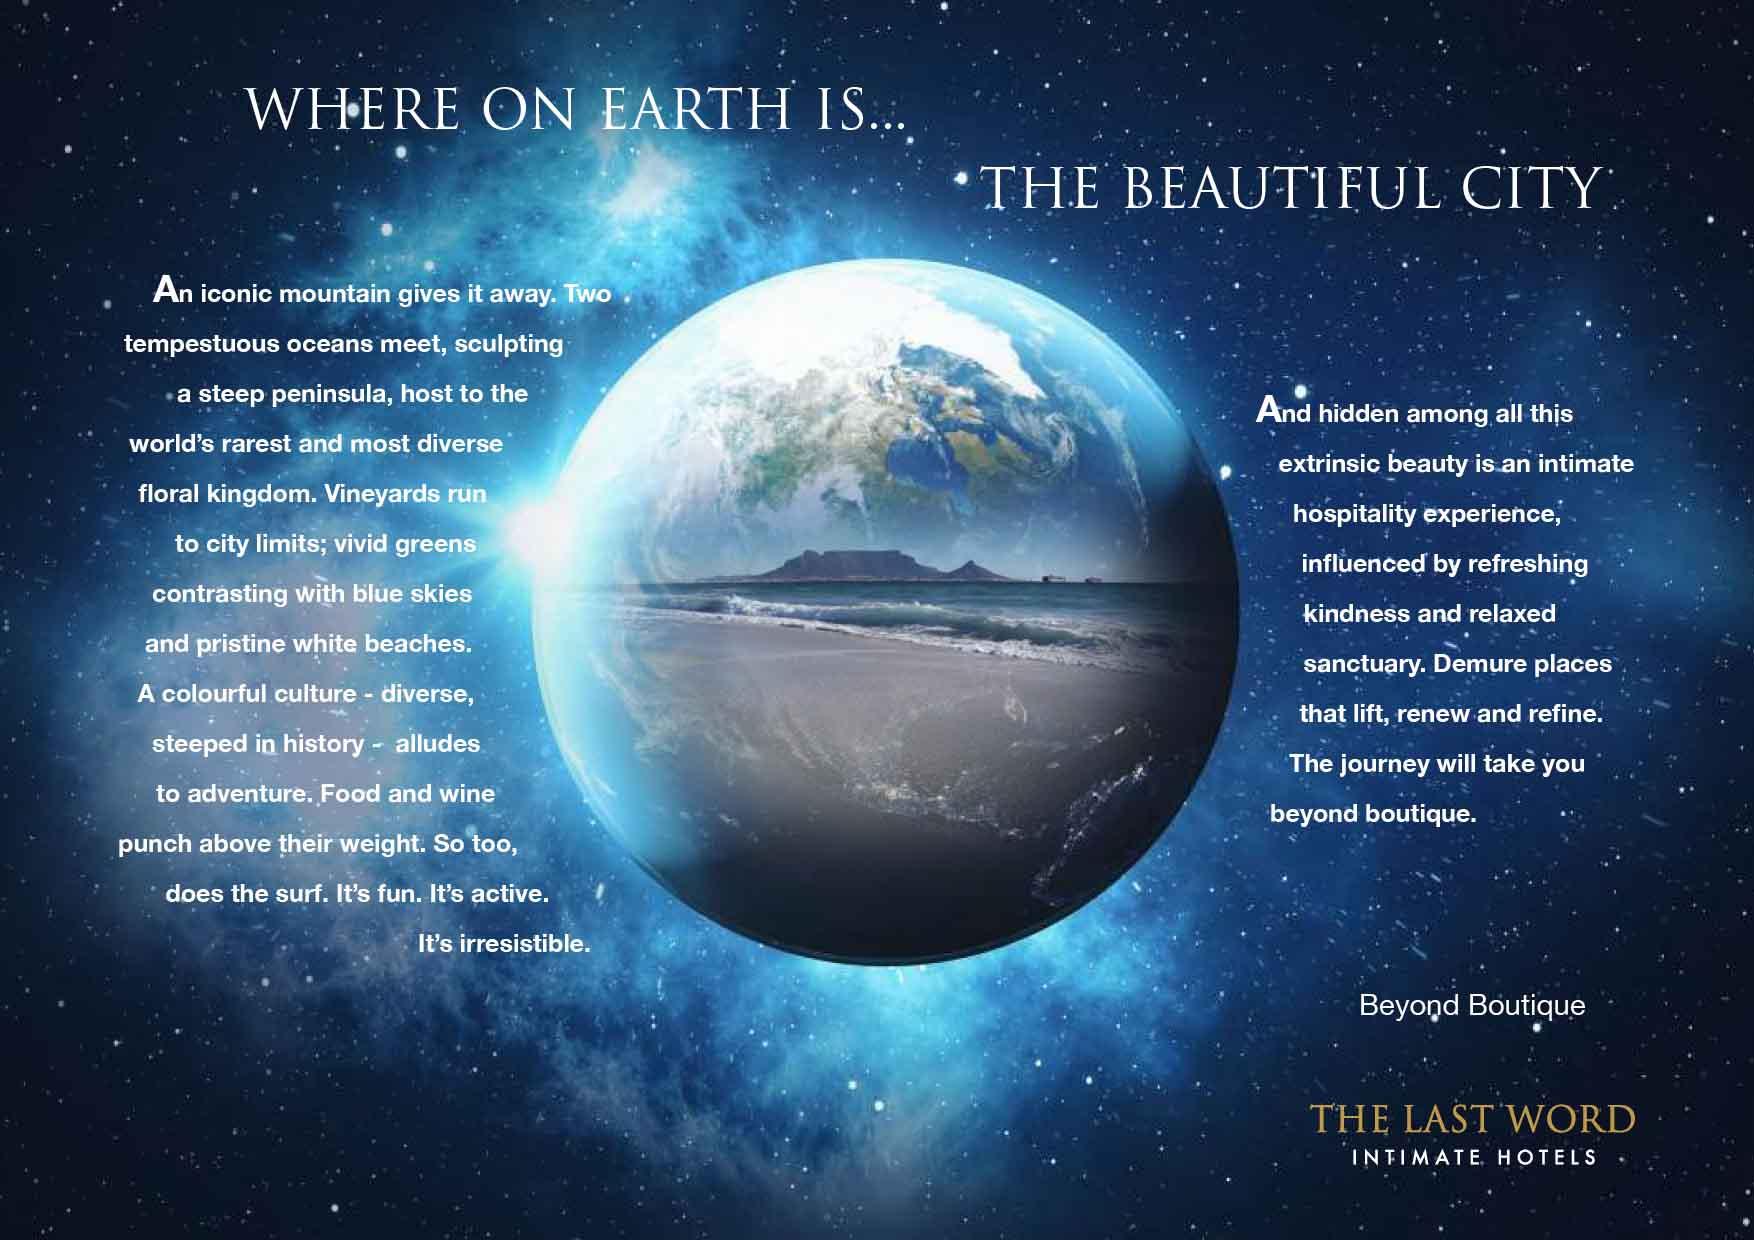 Where on Earth jpeg.jpg